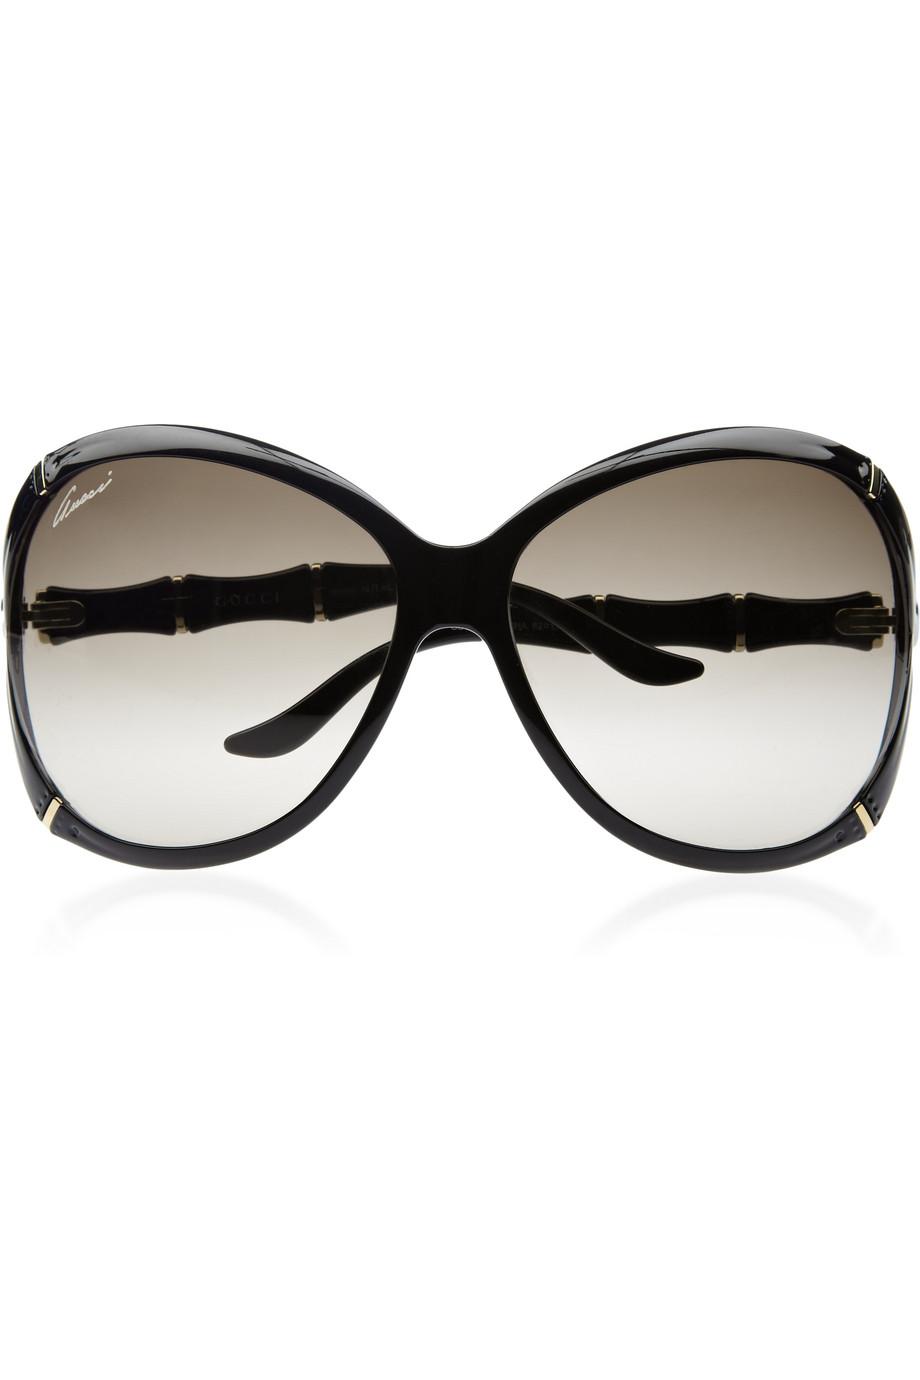 c9dcbf4067 Gucci Oversized Square Frame Acetate Sunglasses in Black